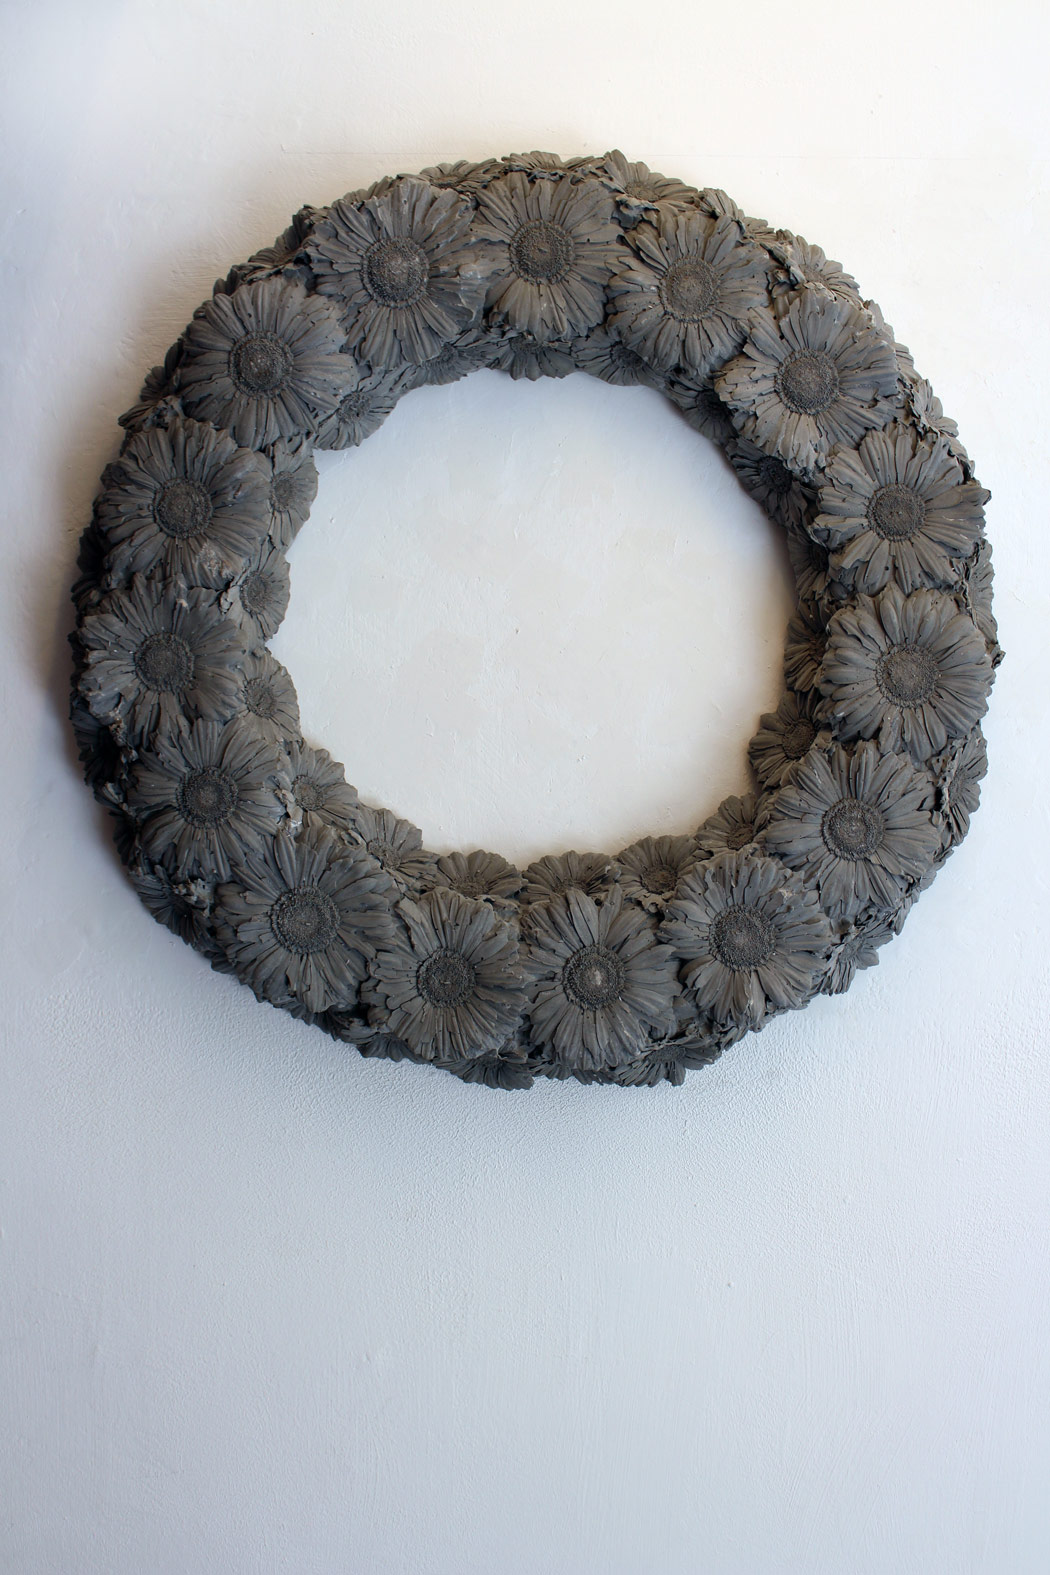 Erez Israeli, Untitled (Garland), 2002, concrete cast, 60 cm diameter